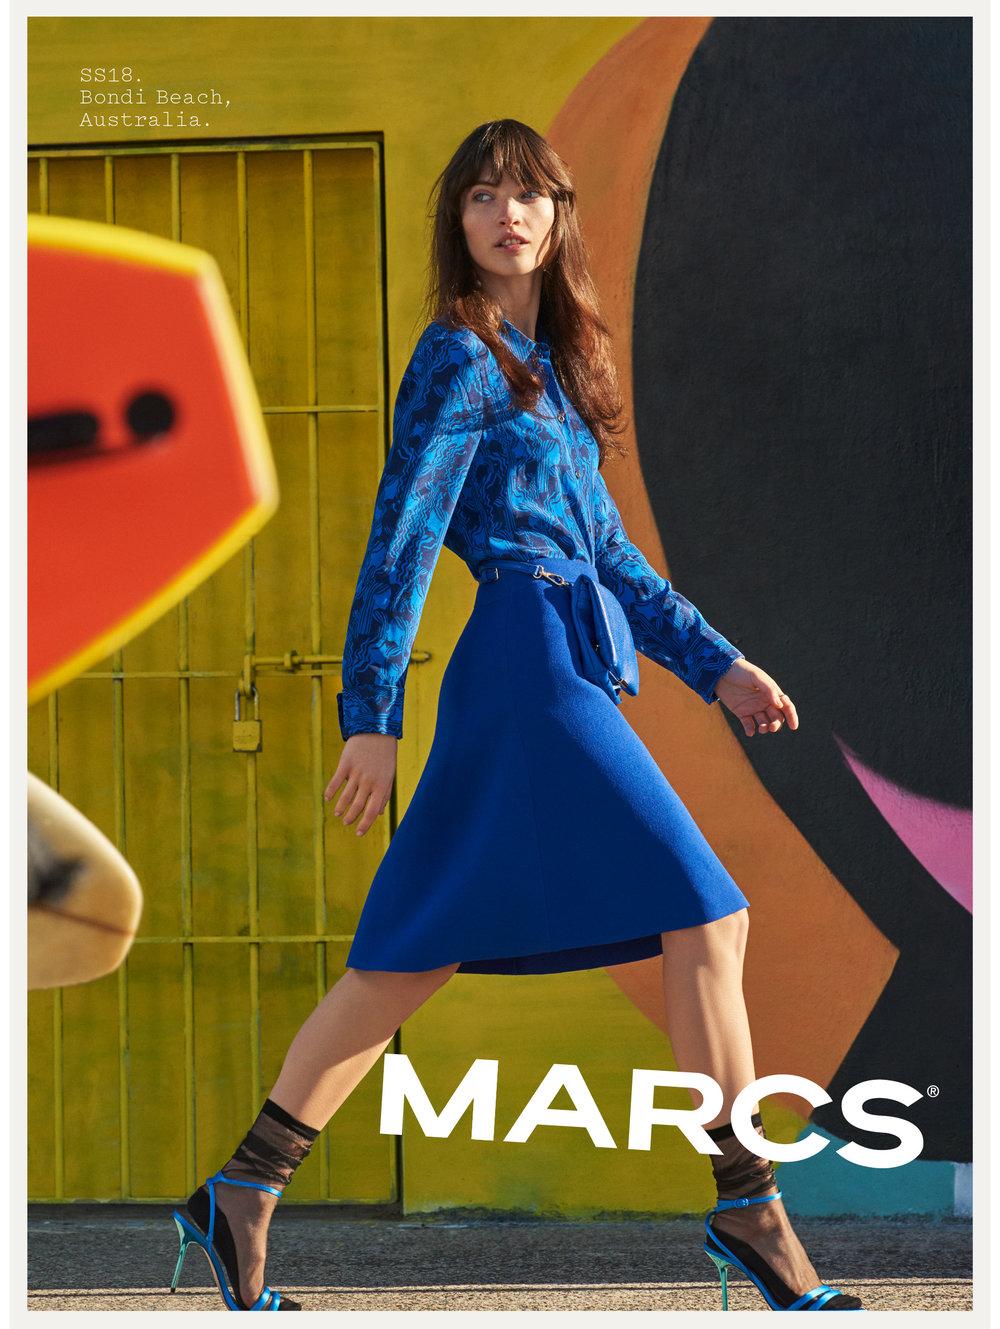 Marcs.jpg